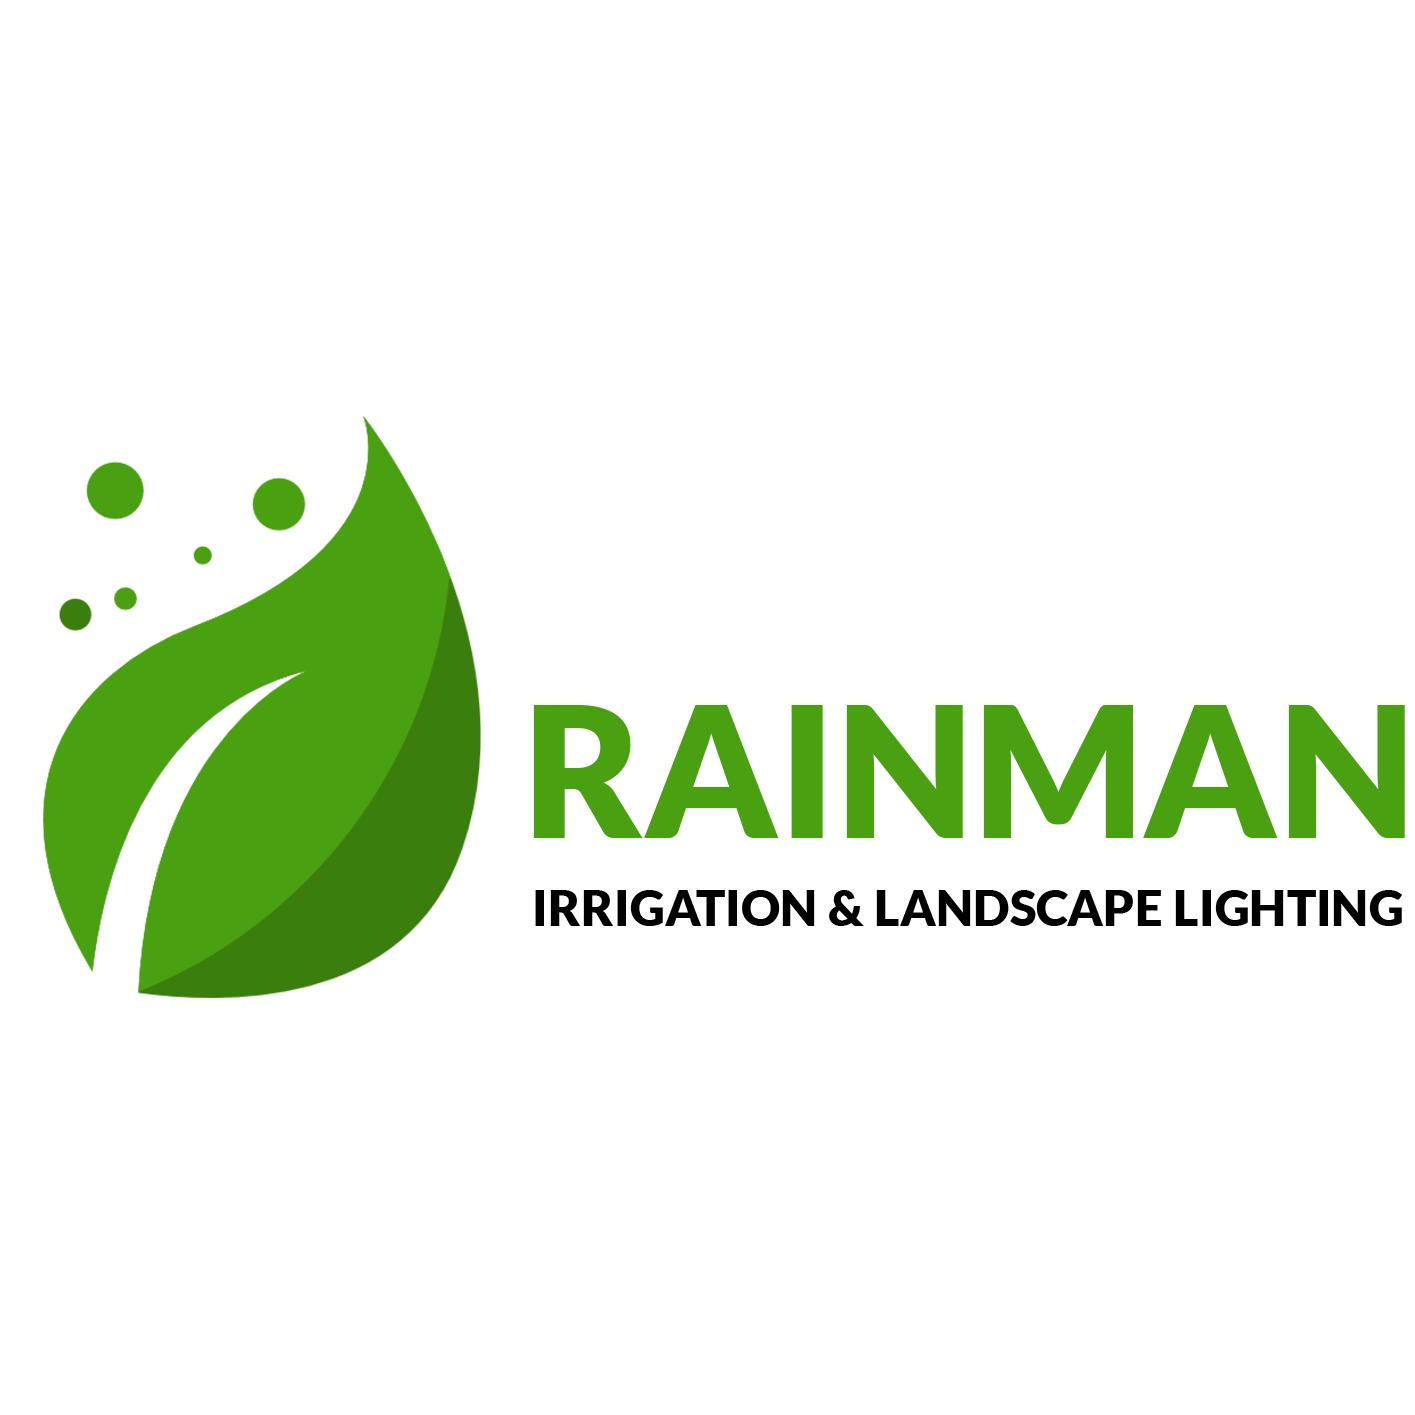 Rainman Irrigation & Landscape Lighting